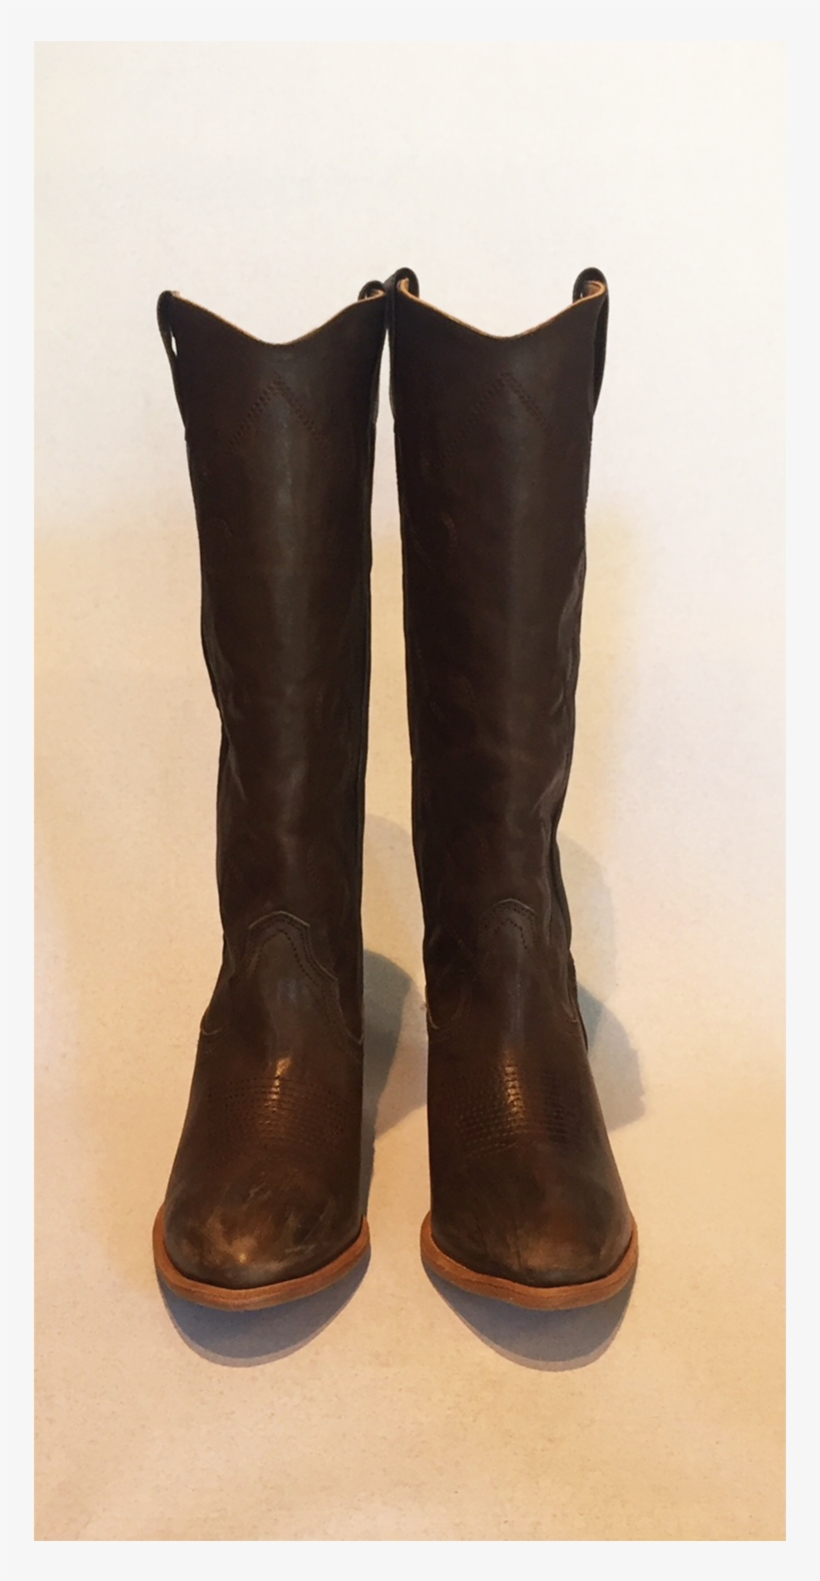 Cowboy Boots High - Riding Boot, transparent png #8742251